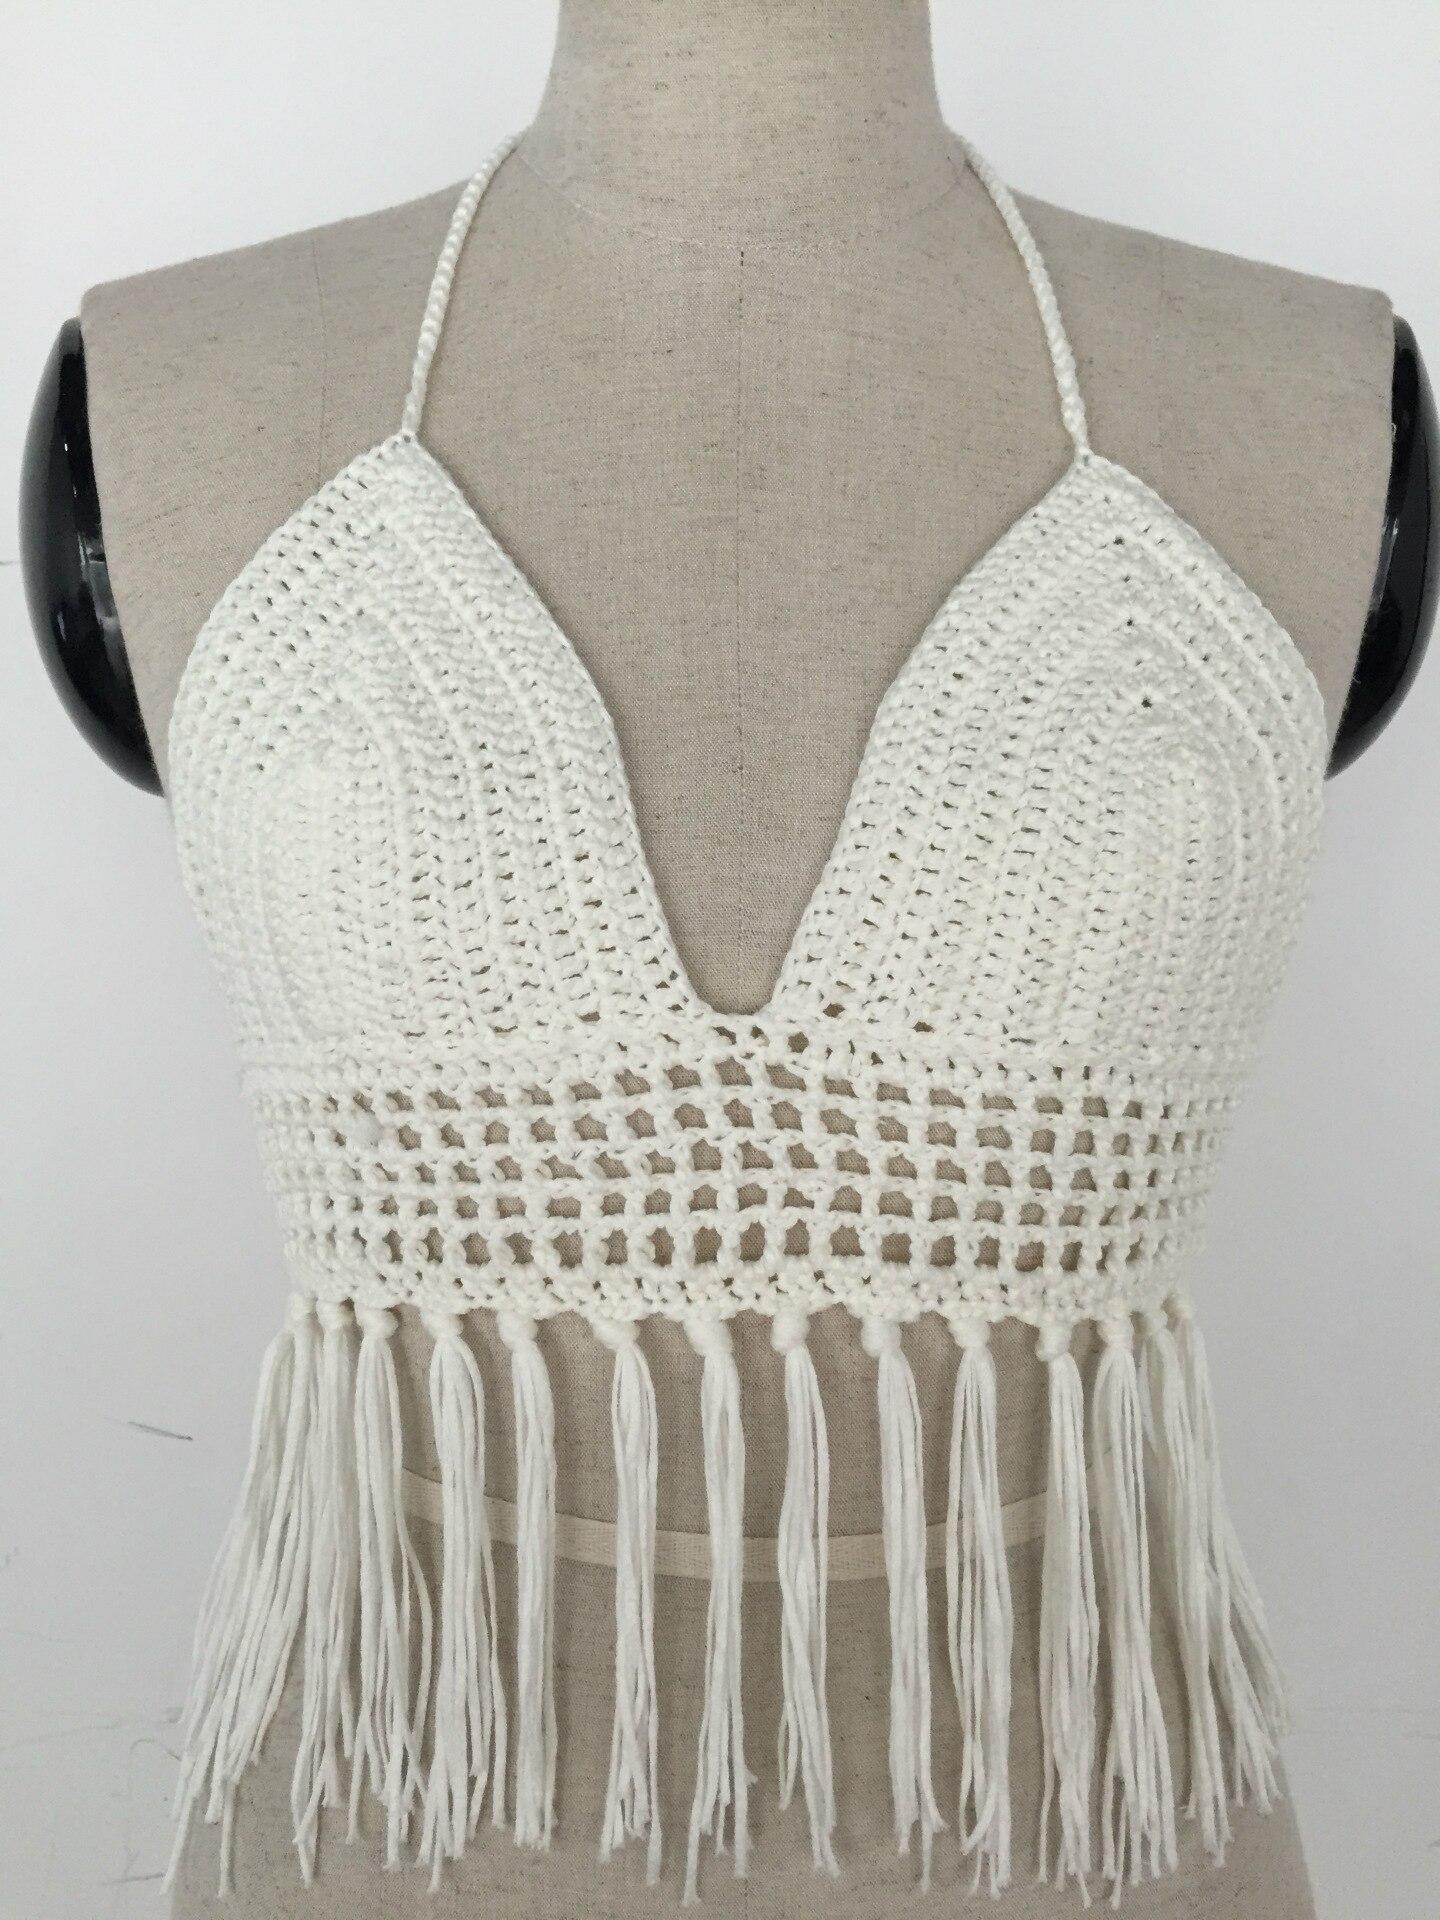 Mujer verano Boho sexy tassel crochet crop tops CAMI Halter handmake ...